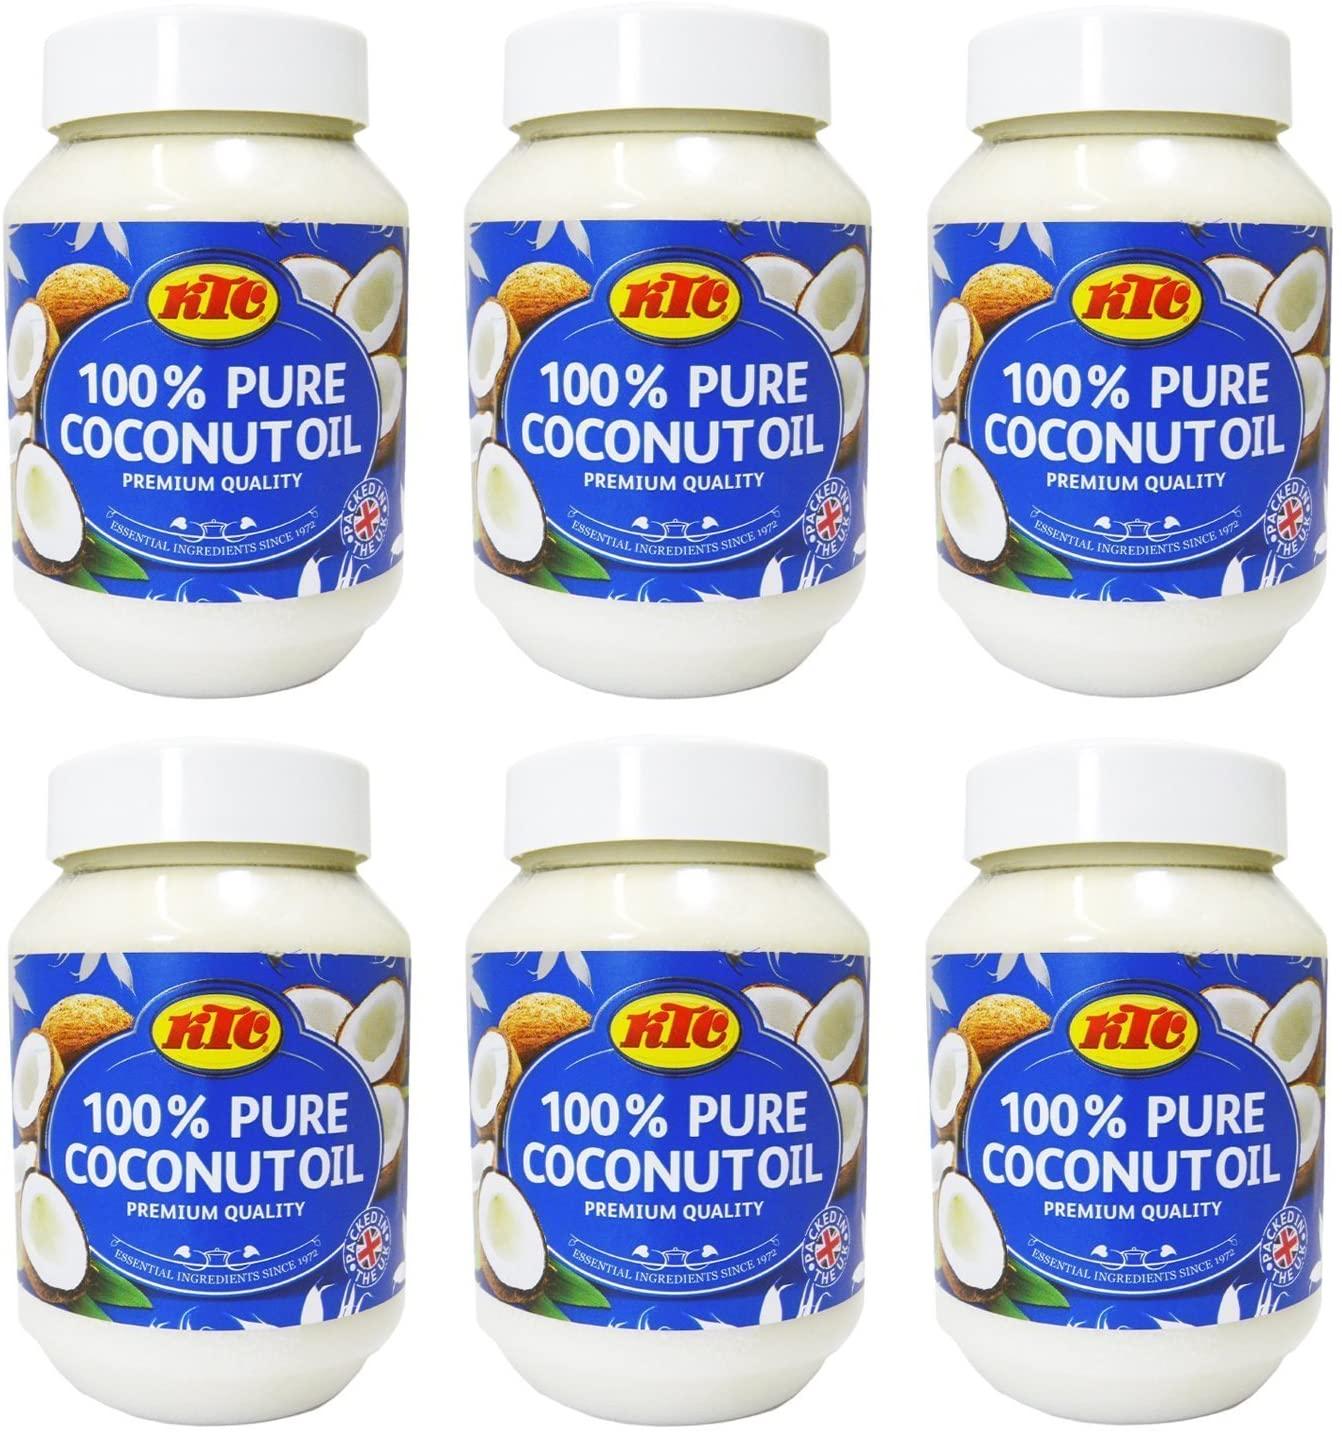 KTC 100% Pure Coconut Multipurpose Oil 500ml Jar x 6 Qty (pack of 6) for £10.50 (Prime) / £14.99 (Non Prime) delivered @ Amazon